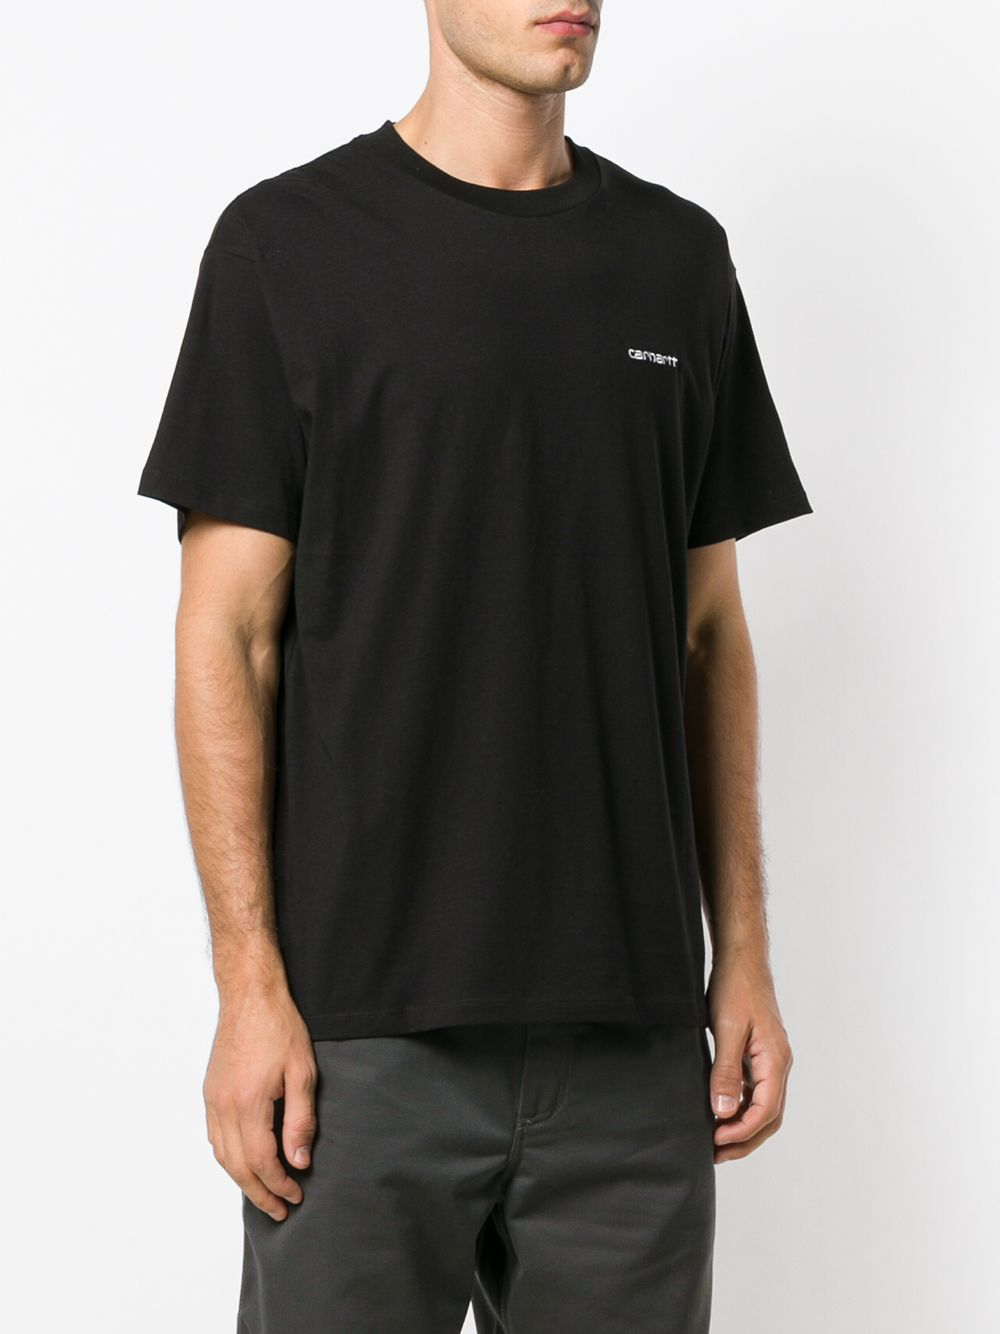 Script embroidery t-shirt Black Cotton Man CARHARTT WIP | T-shirts | I02577889.90